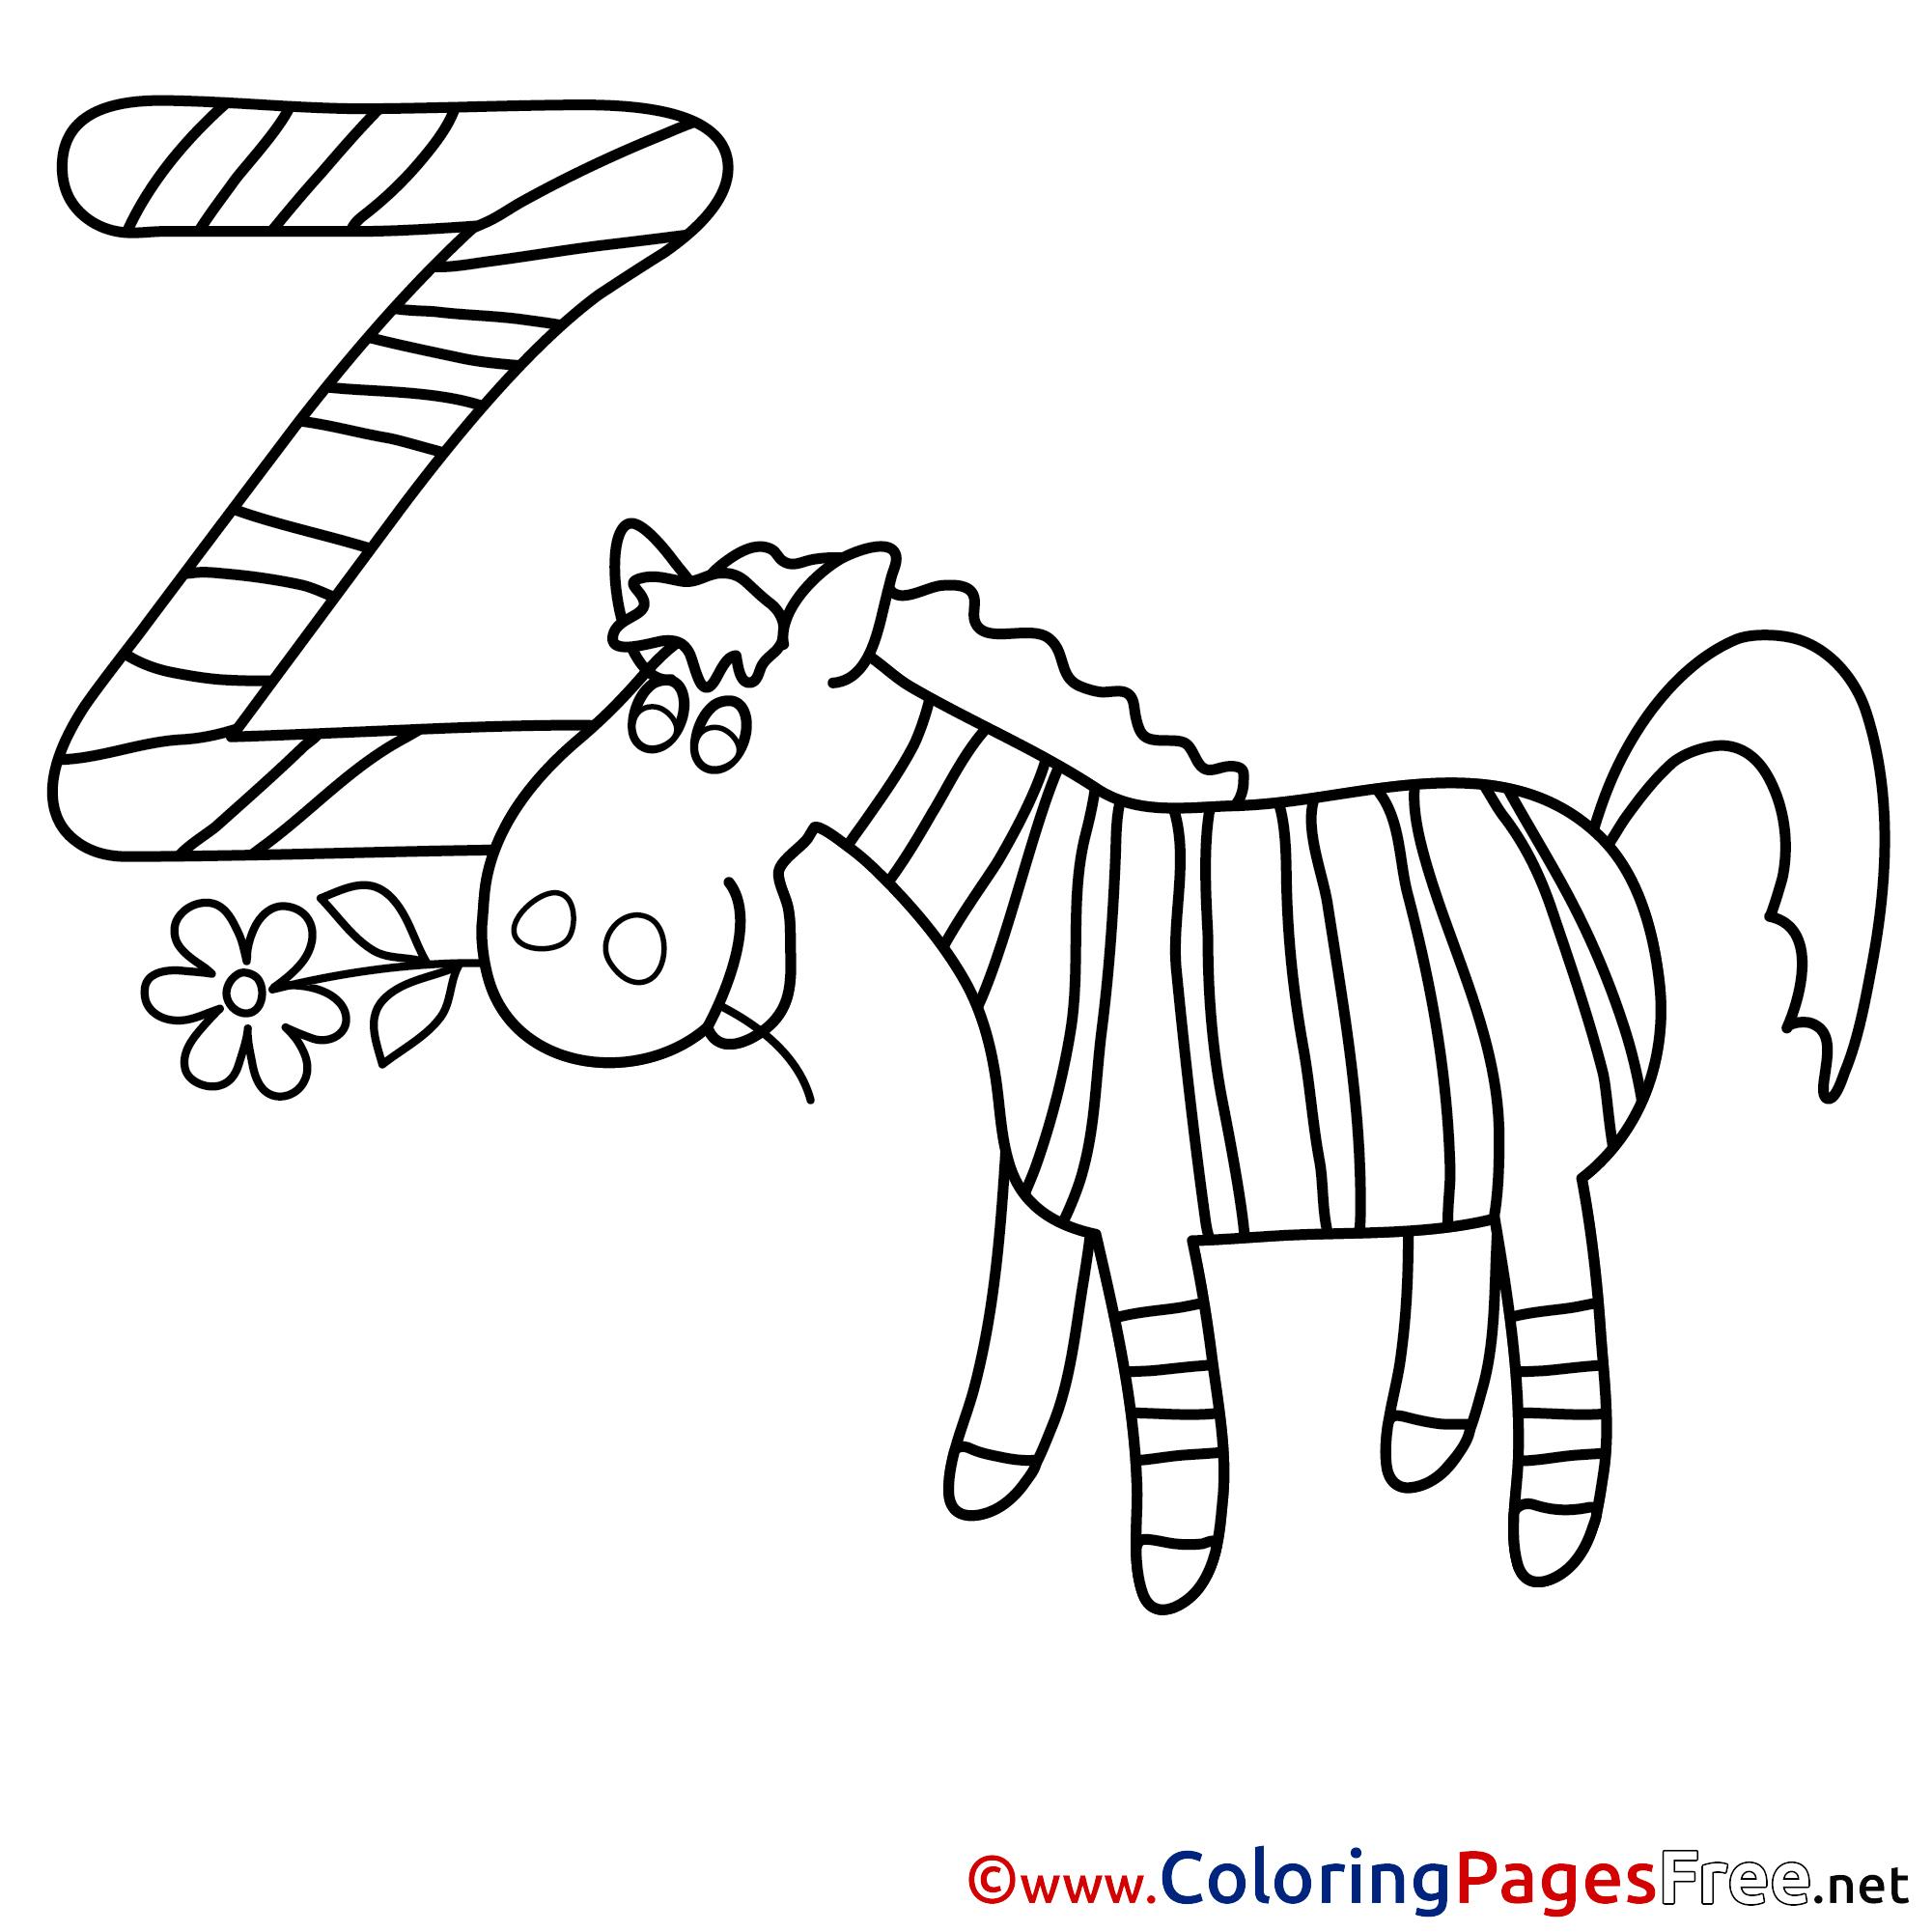 Colouring sheets zebra - Colouring Sheets Zebra 59